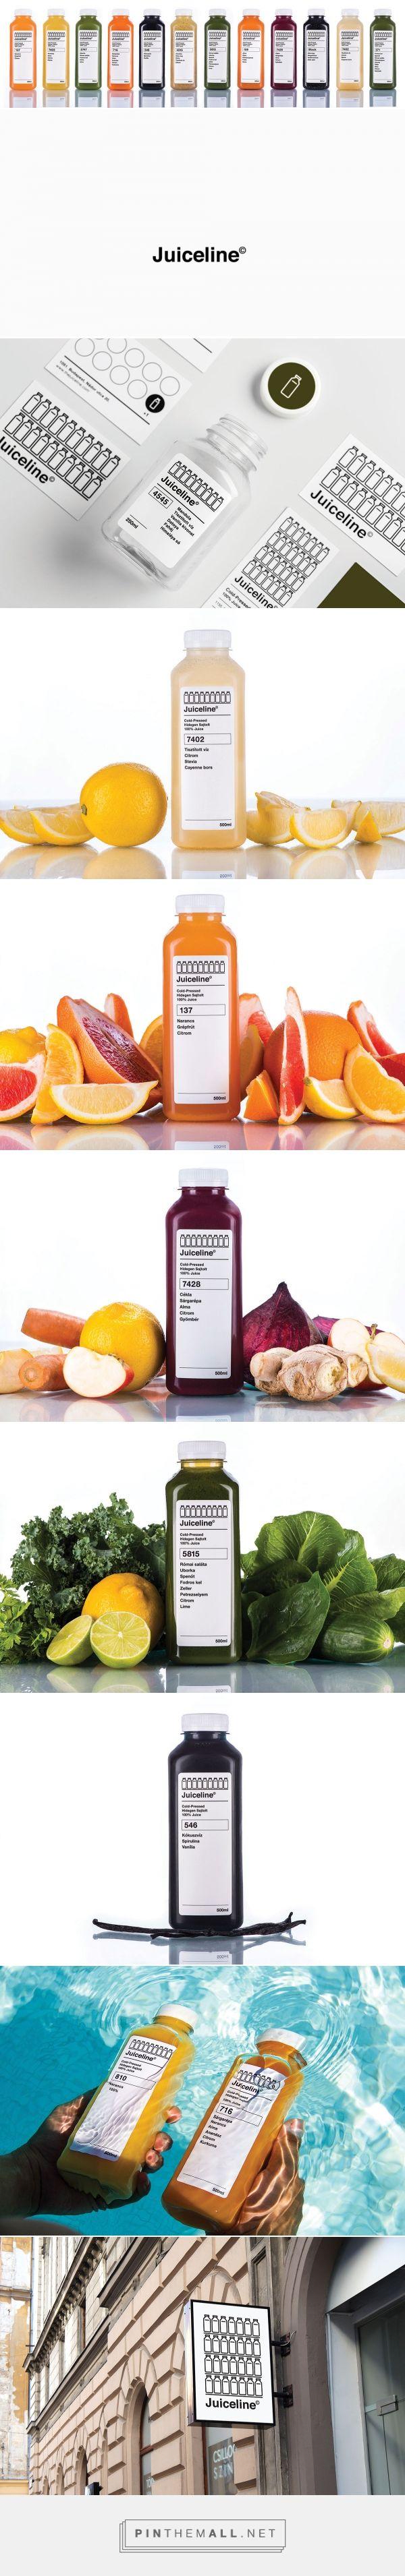 Juiceline / Juiceline is a cold pressed juice brand and bar / design by kissmiklos .